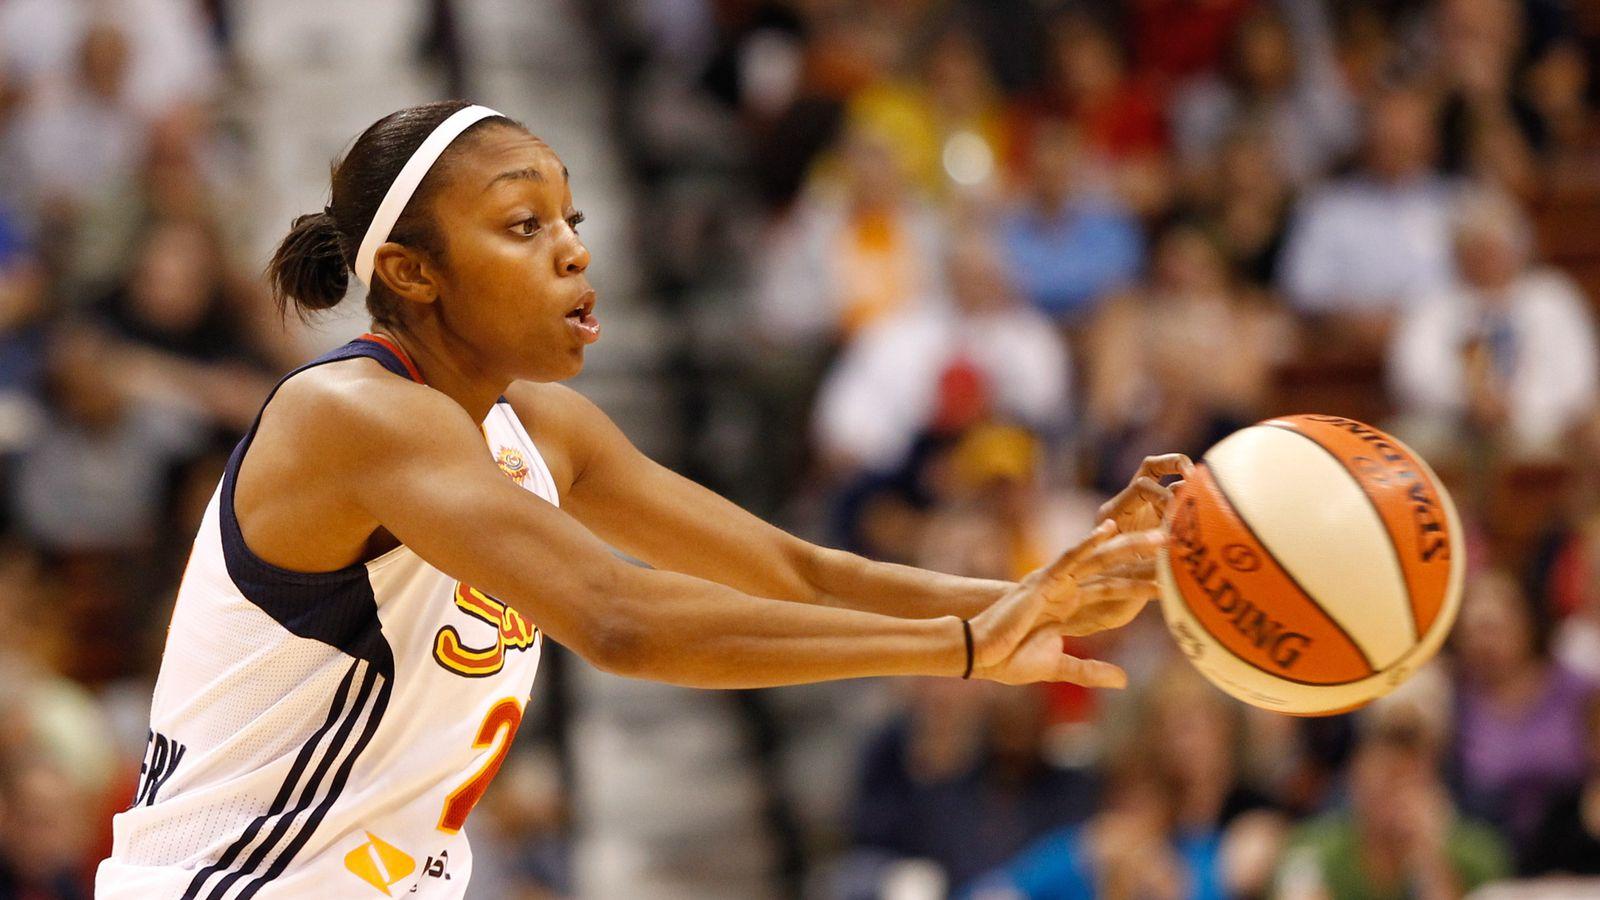 Ky Basketball Score Today | Basketball Scores